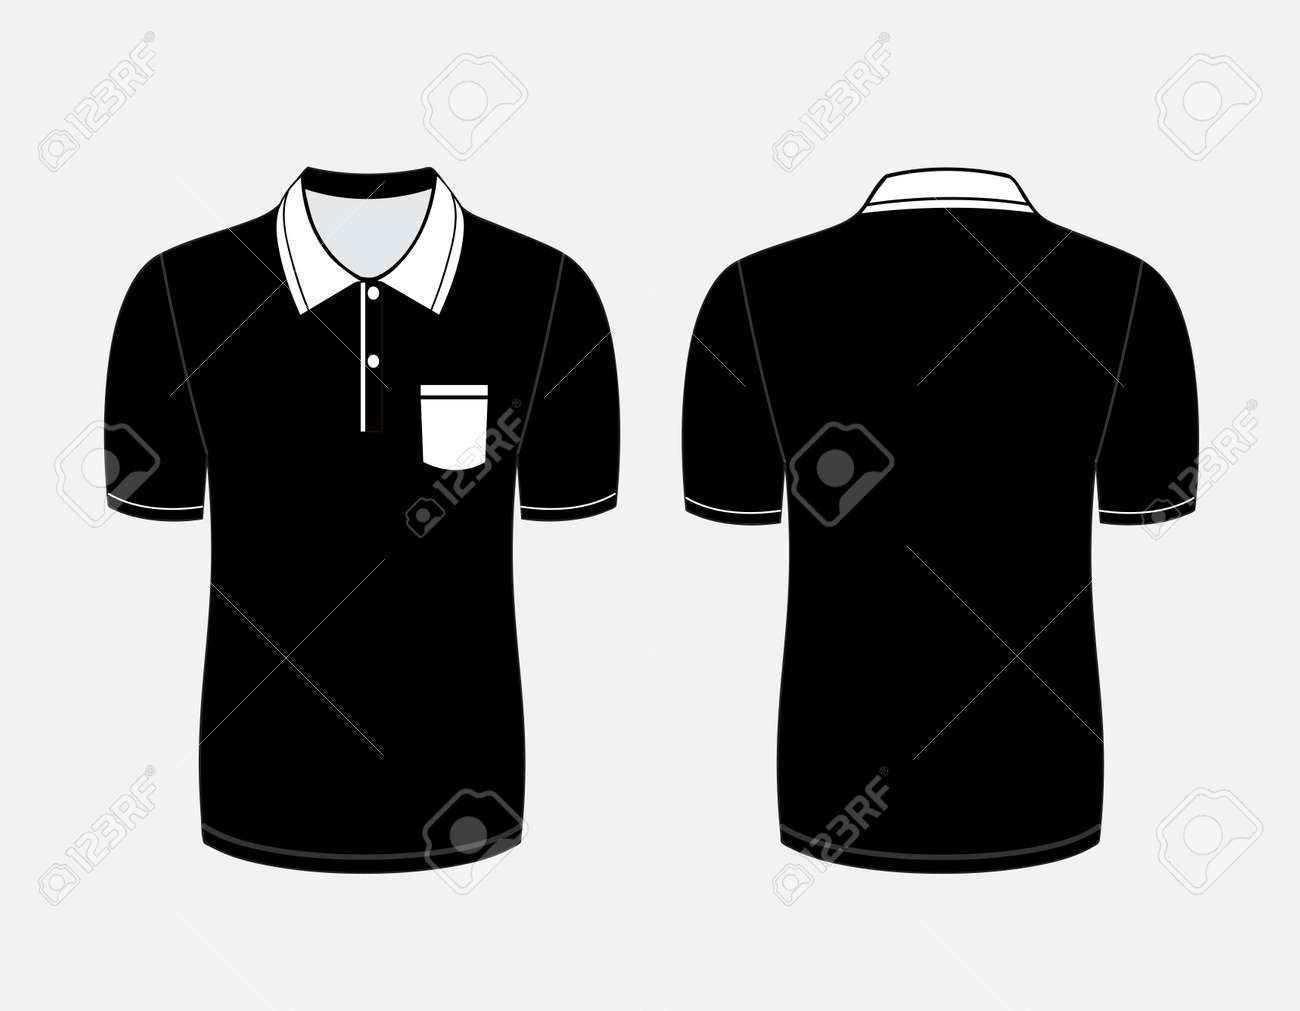 Black t shirt front and back - Black T Shirt Vector Front And Back Vector Vector Illustration Of Black Polo T Shirt